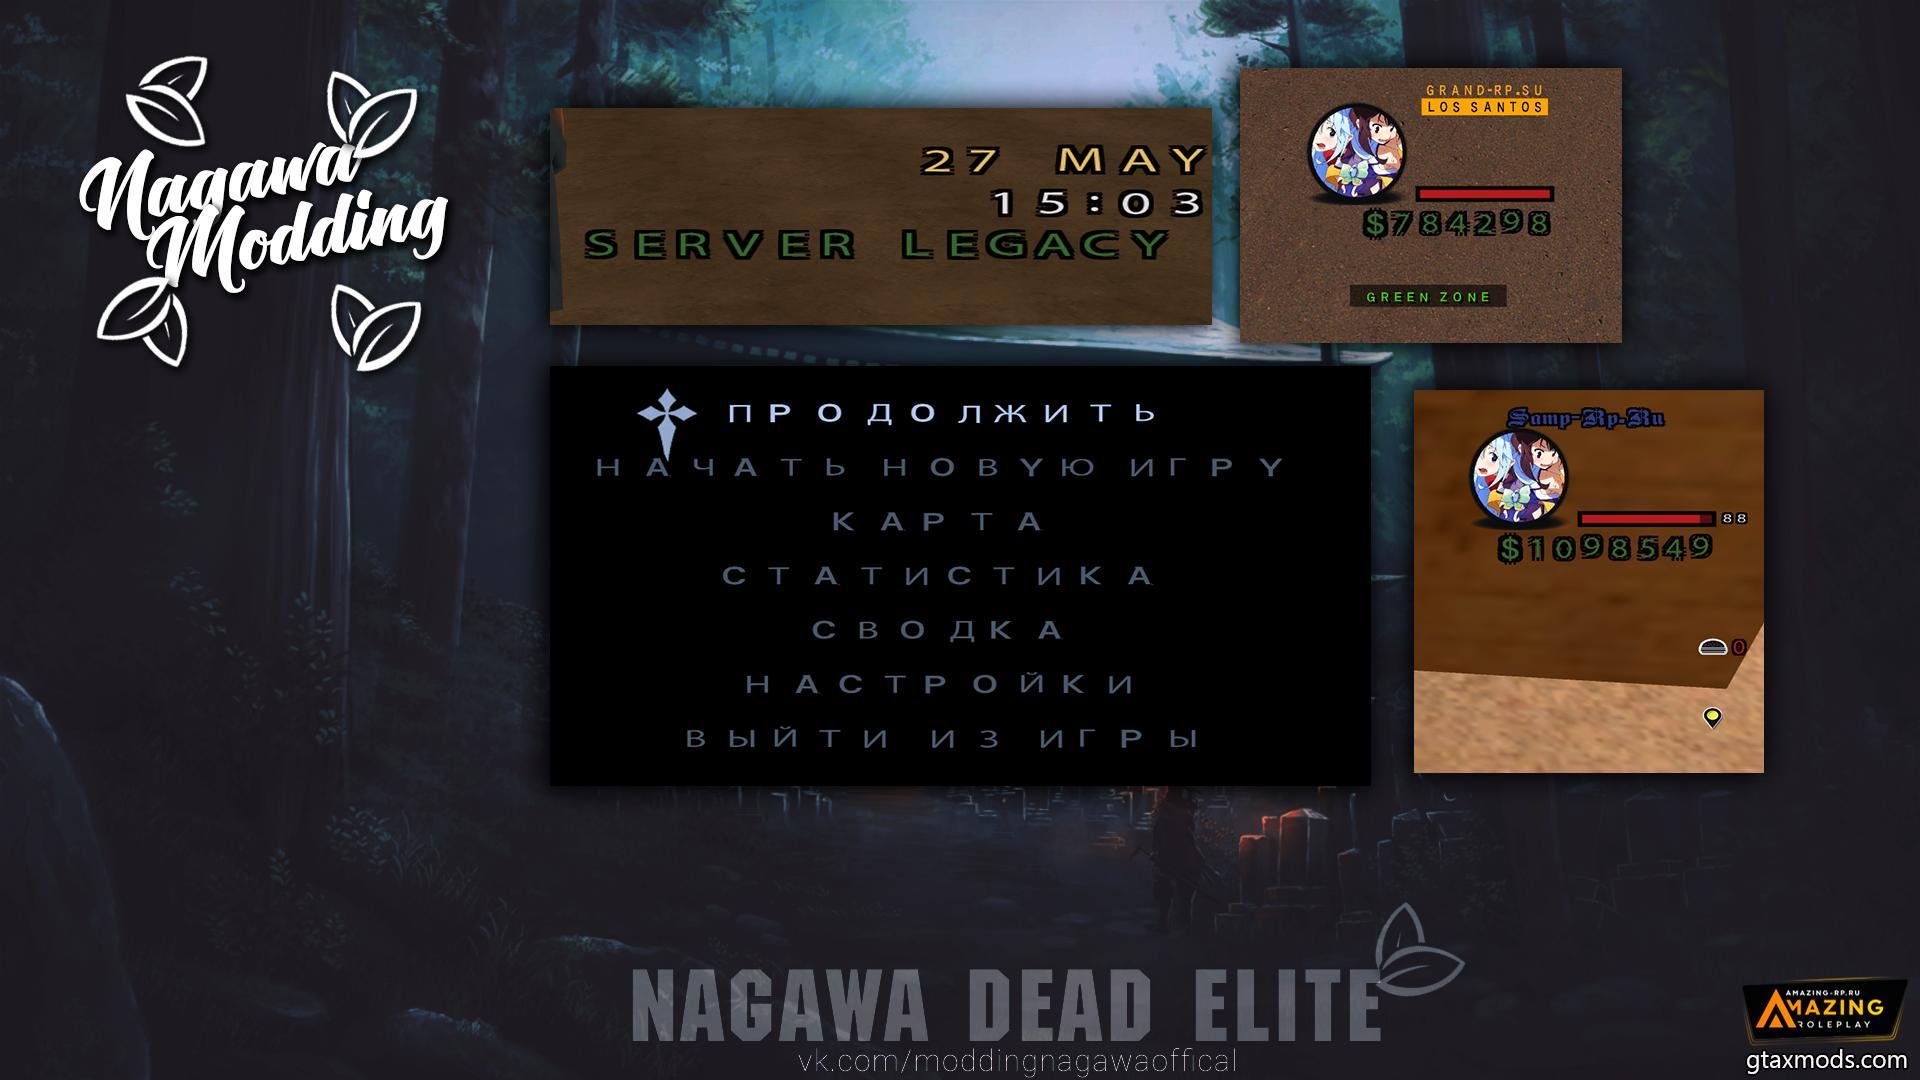 Mono Fonts Nagawa Dead Elite